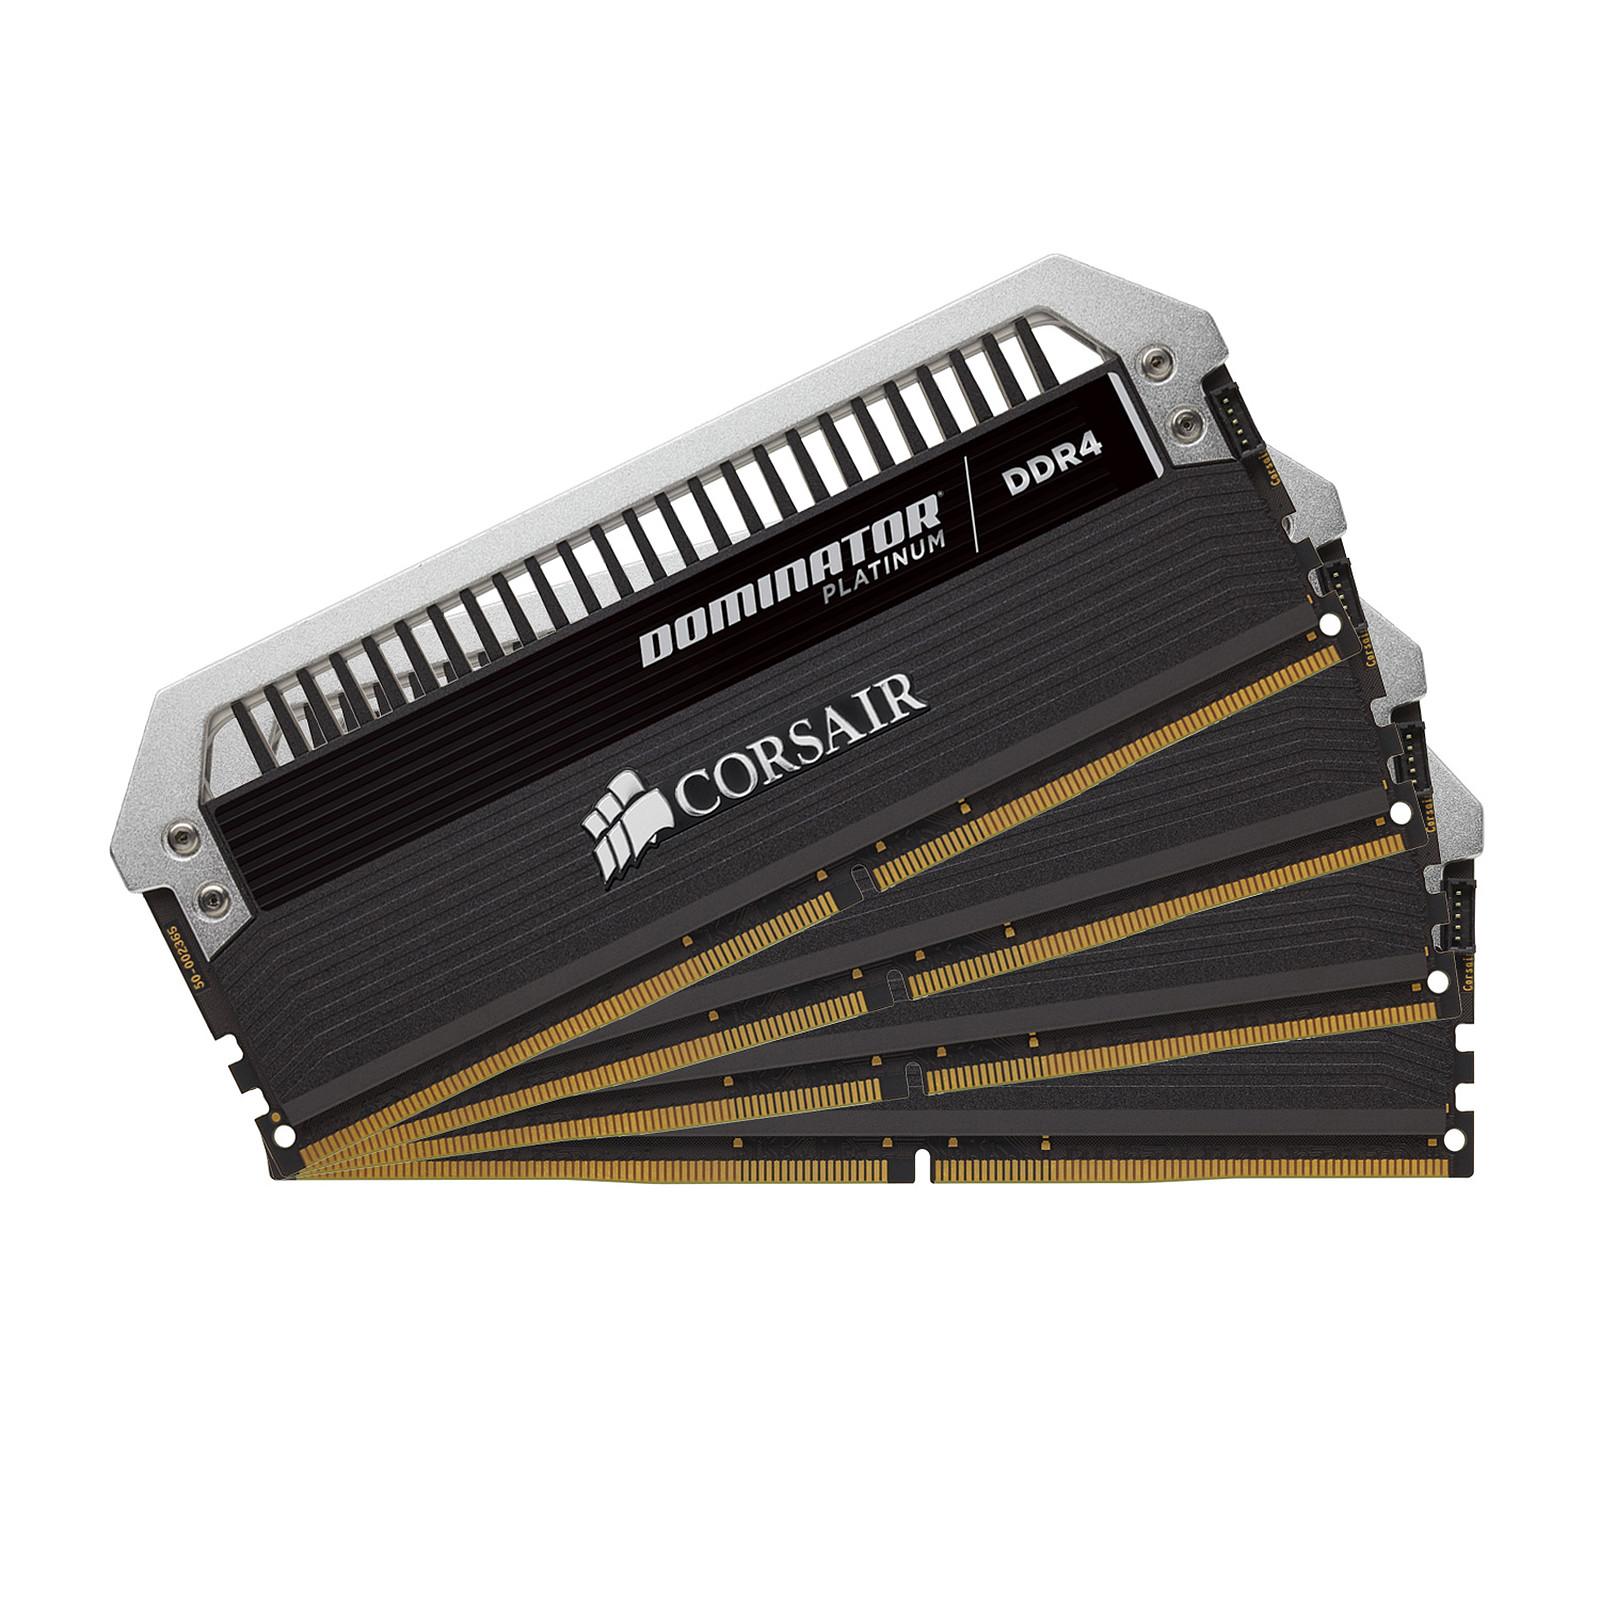 Corsair Dominator Platinum 32 Go (4x 8 Go) DDR4 3000 MHz CL15